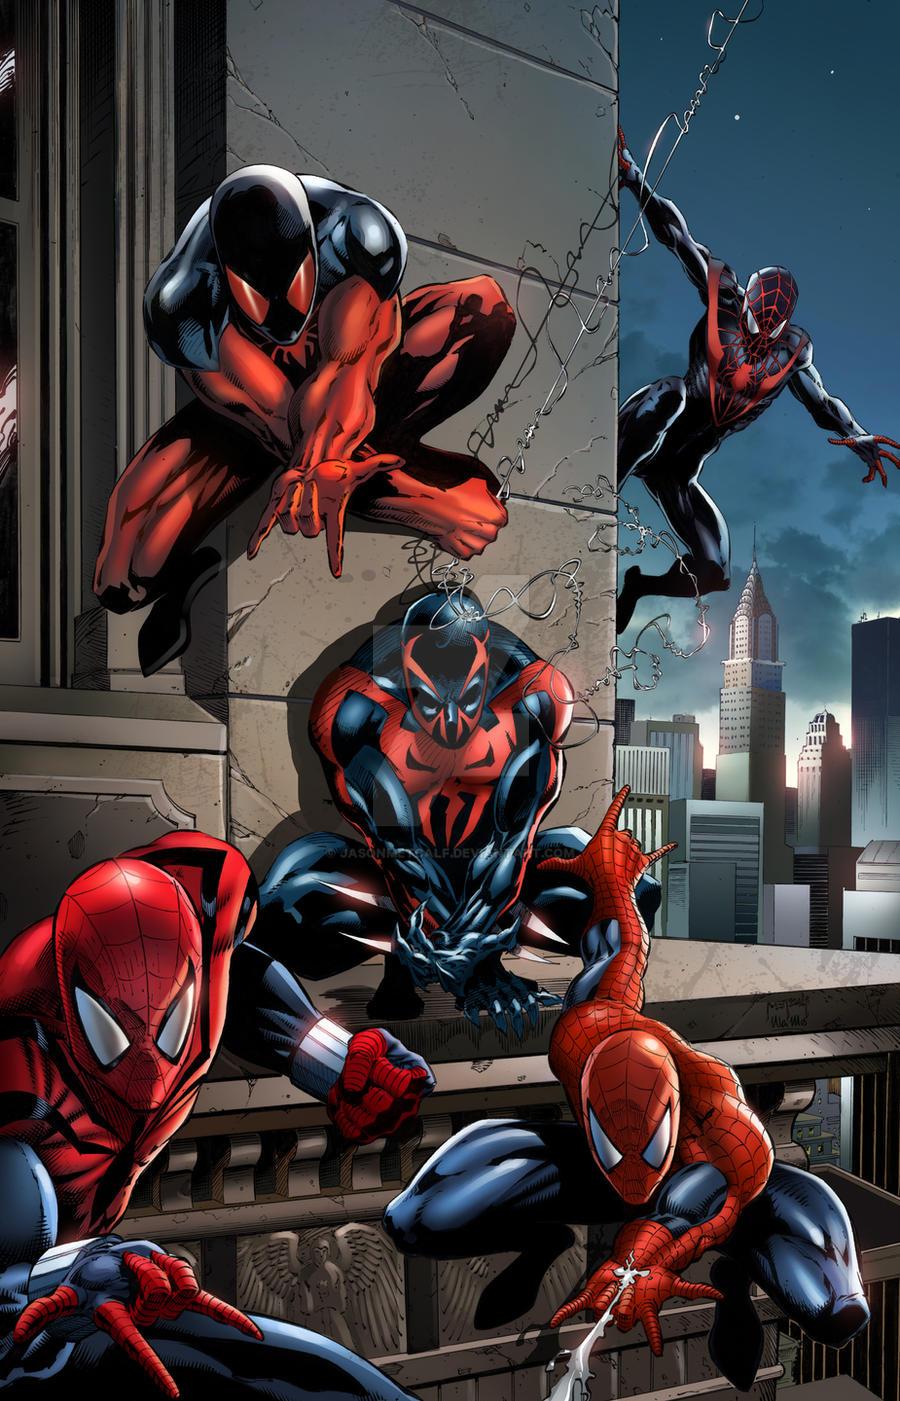 Five Spidey S Spiderman Costumes Jason Metcalf By Jasonmetcalf